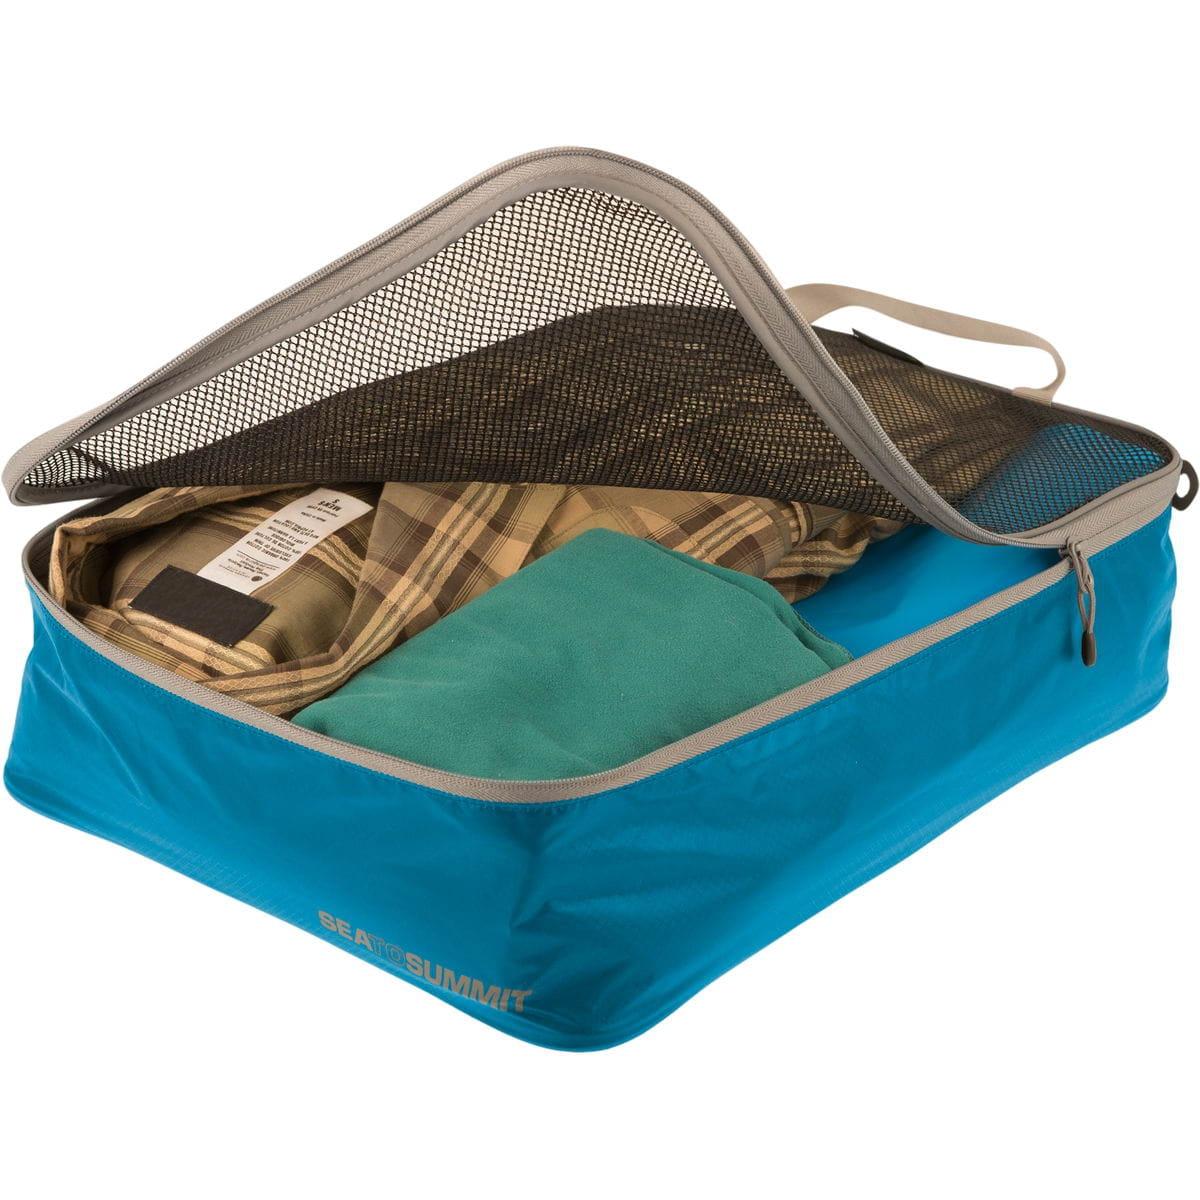 Sea to Summit TravellingLight™ Garment Mesh Bags Größe M blue-grey - Bild 1